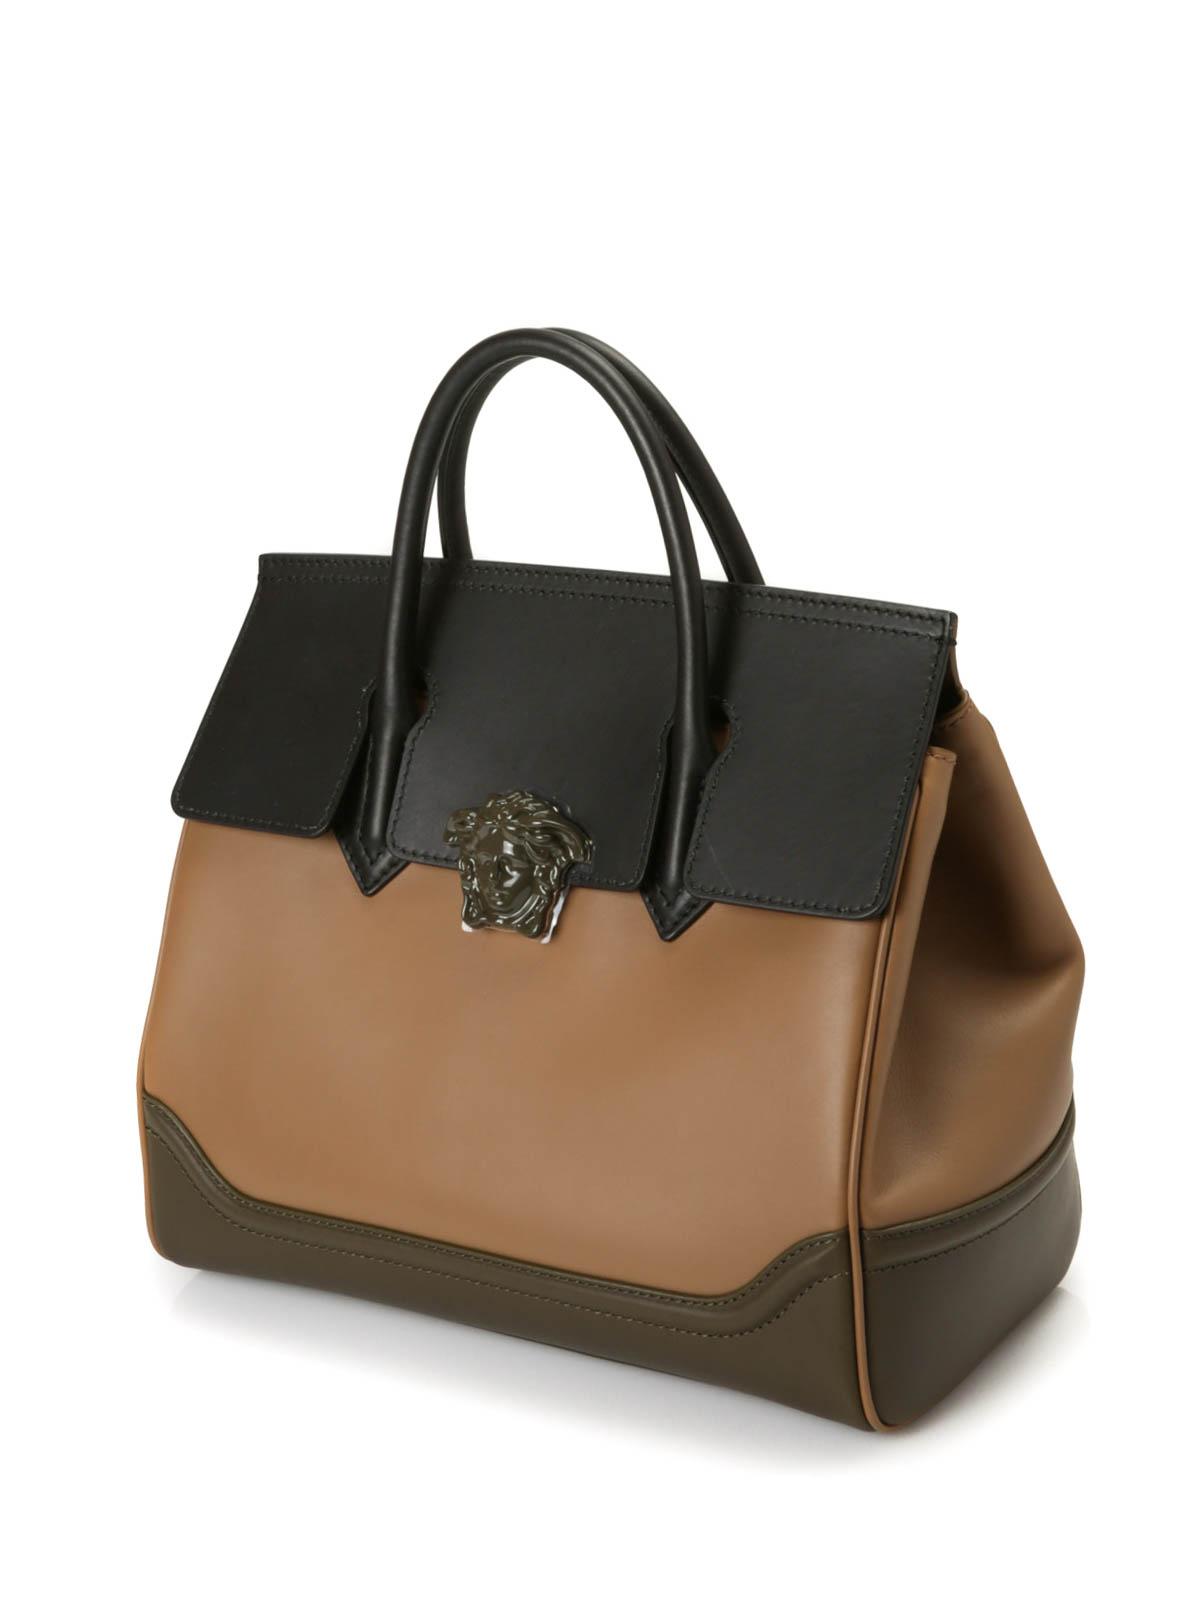 Versace - Palazzo Empire tote - totes bags - DBFF453 DSTVT KM4JO 283c11dc01144